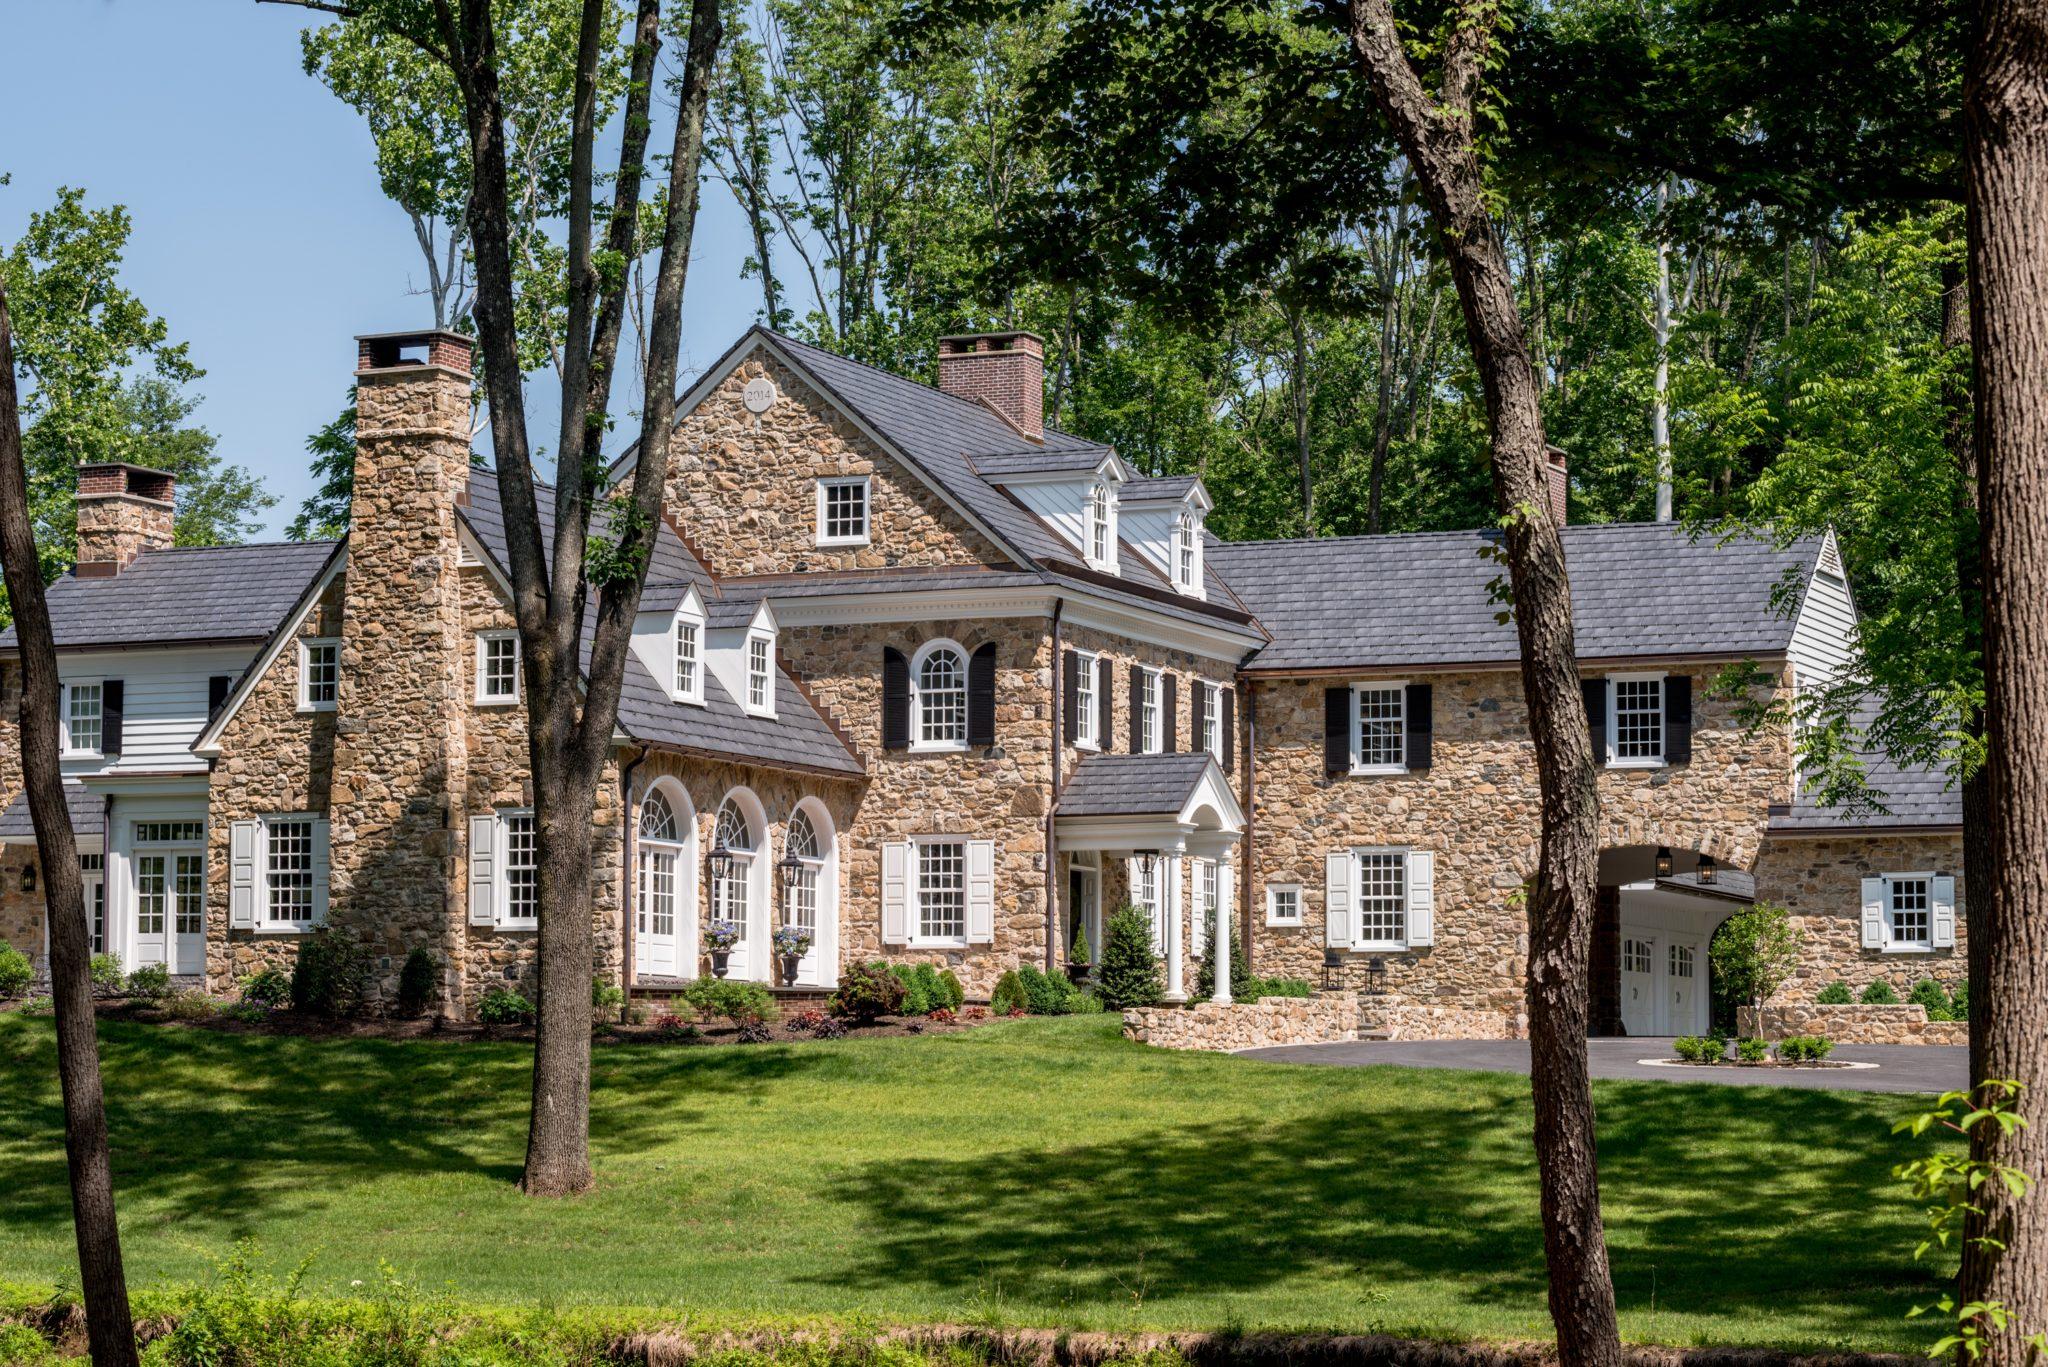 Colonial Revival Farmhouse with porte cochere - Montogomery County, Pennsylvania by Period Architecture